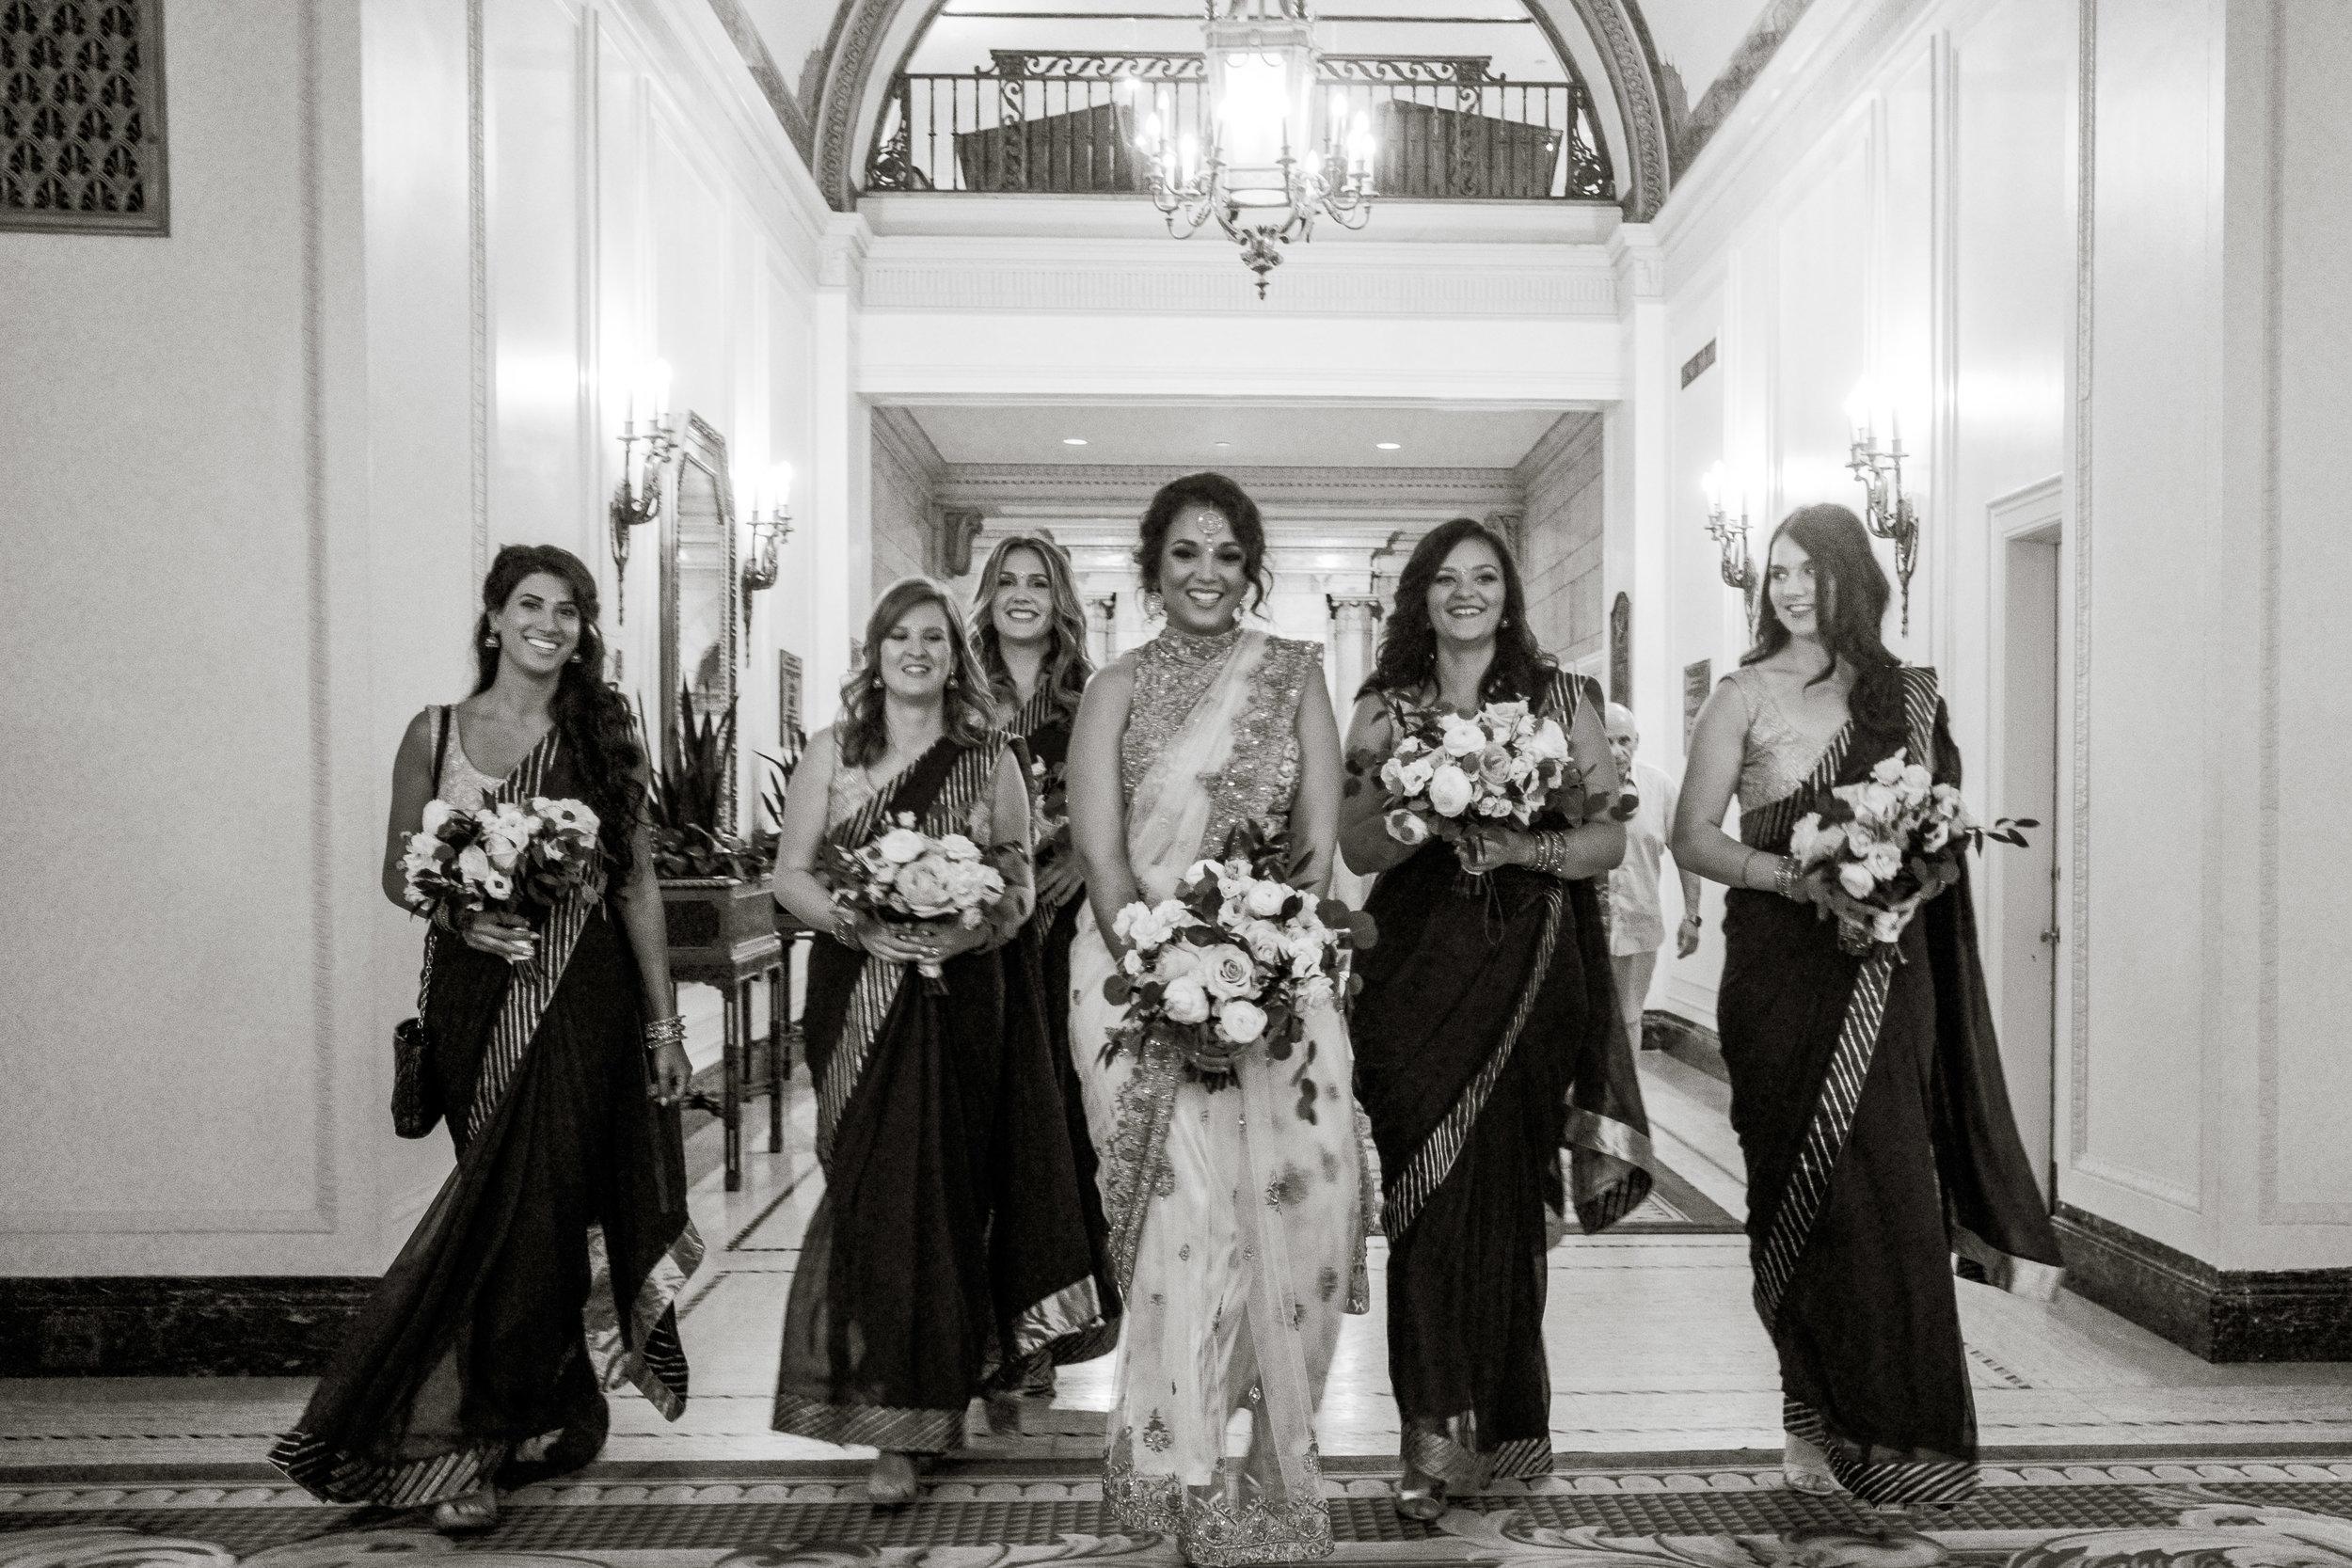 Komal Minhas Wedding Chateau Laurier, Toast Events